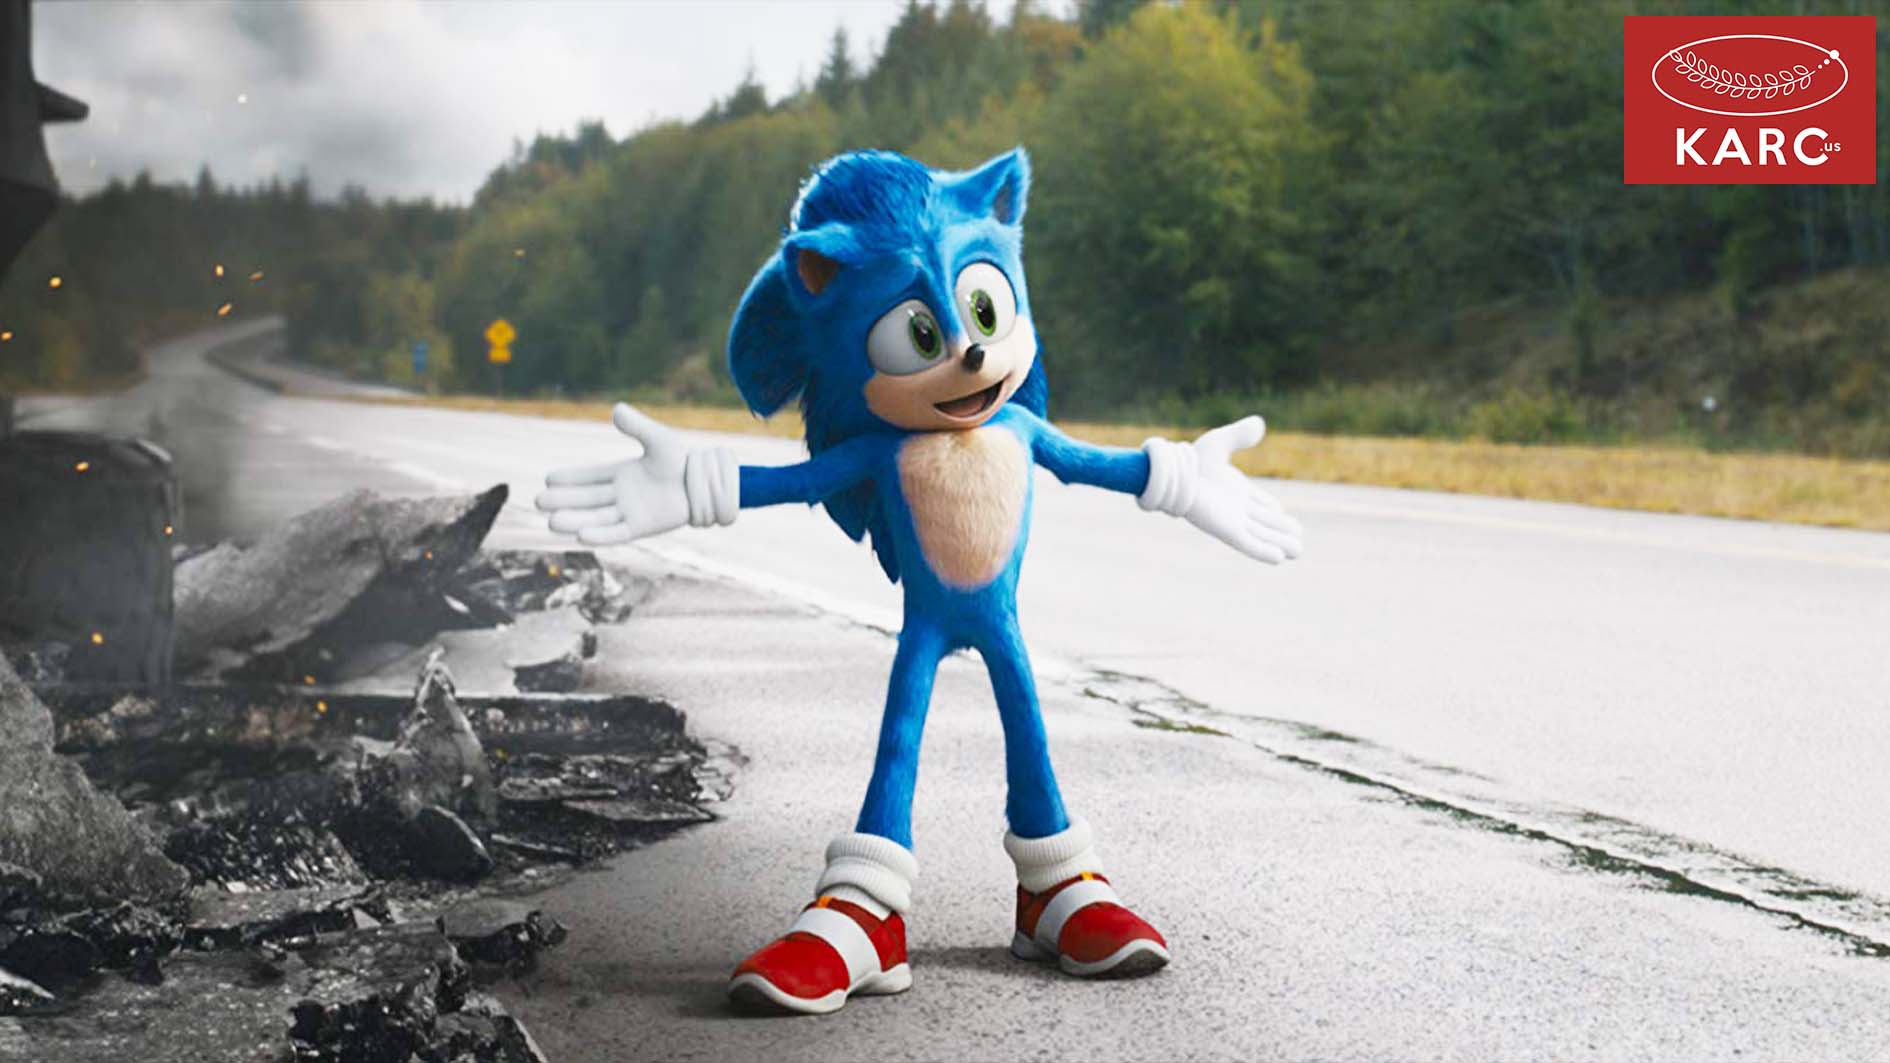 Sonic the Hedgehog นี้ บอกเล่าเรื่องของ Sonic ซึ่งเขาเป็นสิ่งมีชีวิตในต่างดาว คล้ายเม่นบนโลกของเรา - Karc.us